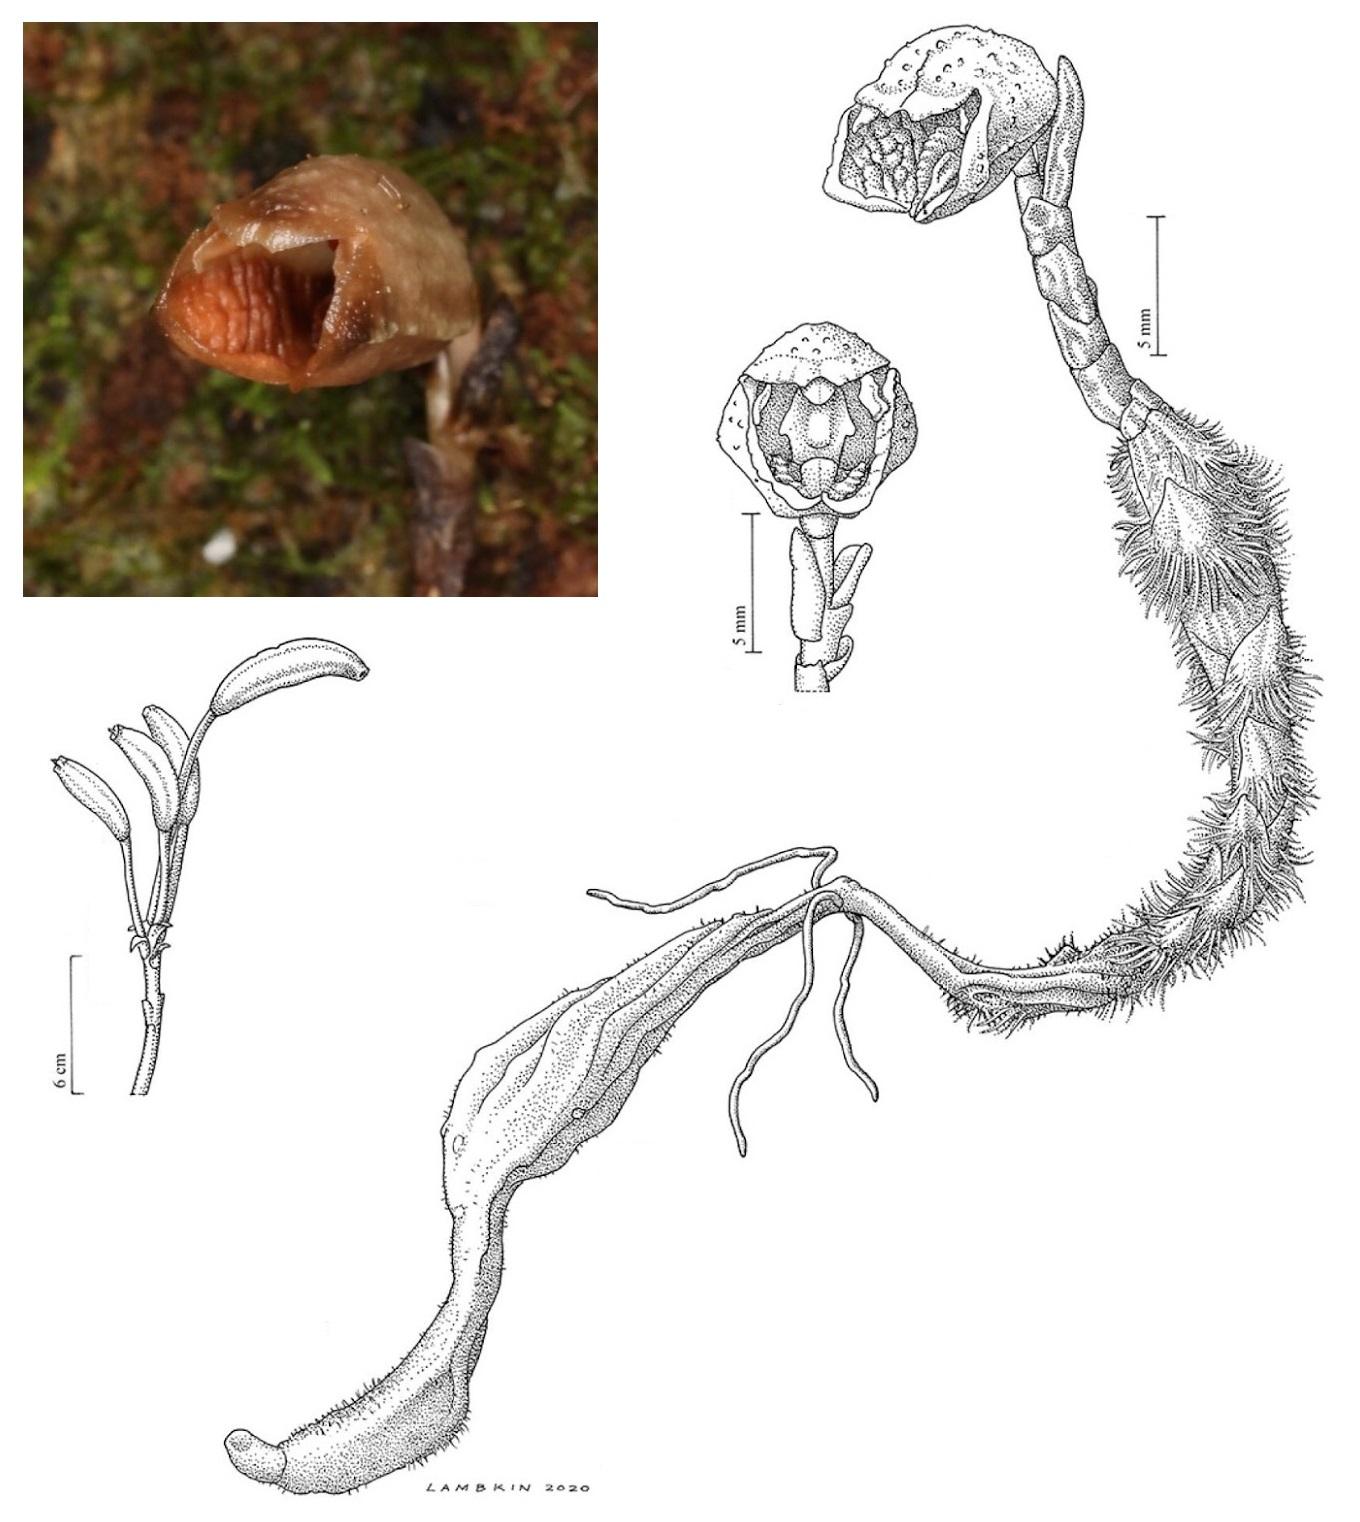 Gastrodia_agnicellus-novataxa_2020-Hermans_et_Cribb__sciArt_@DeborahLambkin (1)